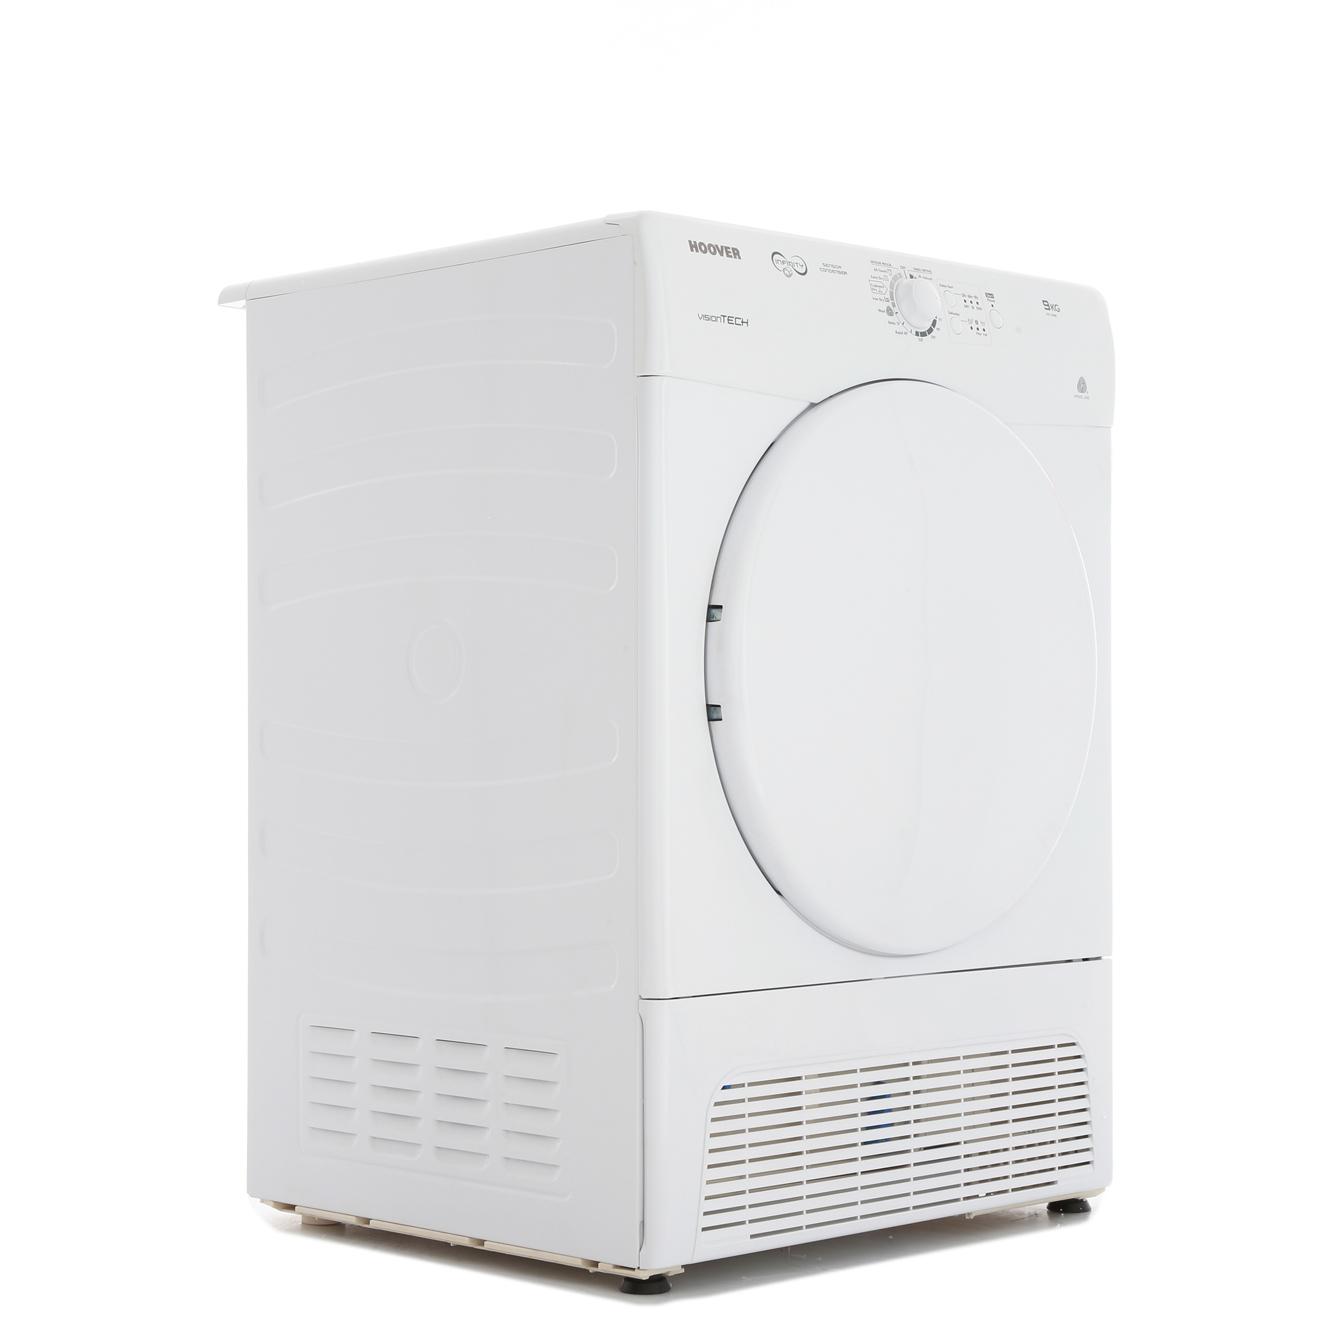 Hoover VTC590B Condenser Dryer